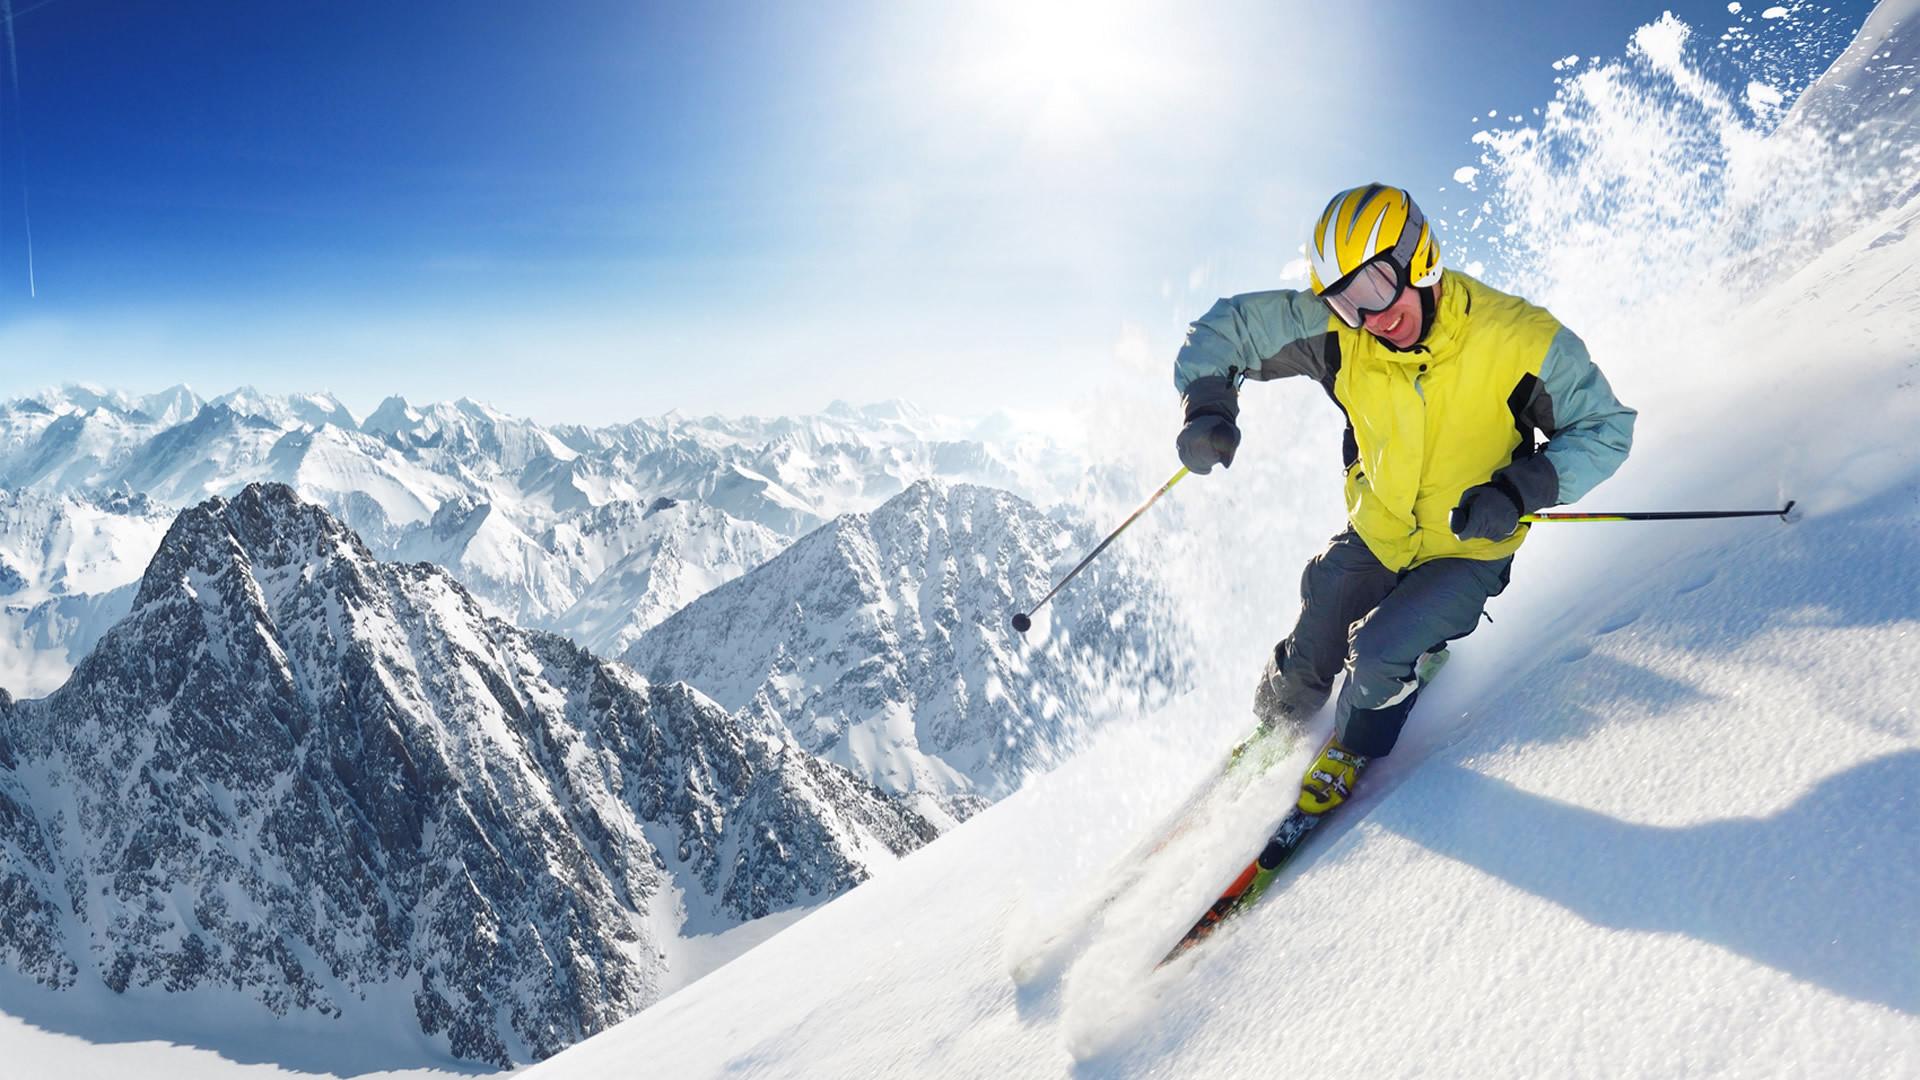 Skiing Wallpaper